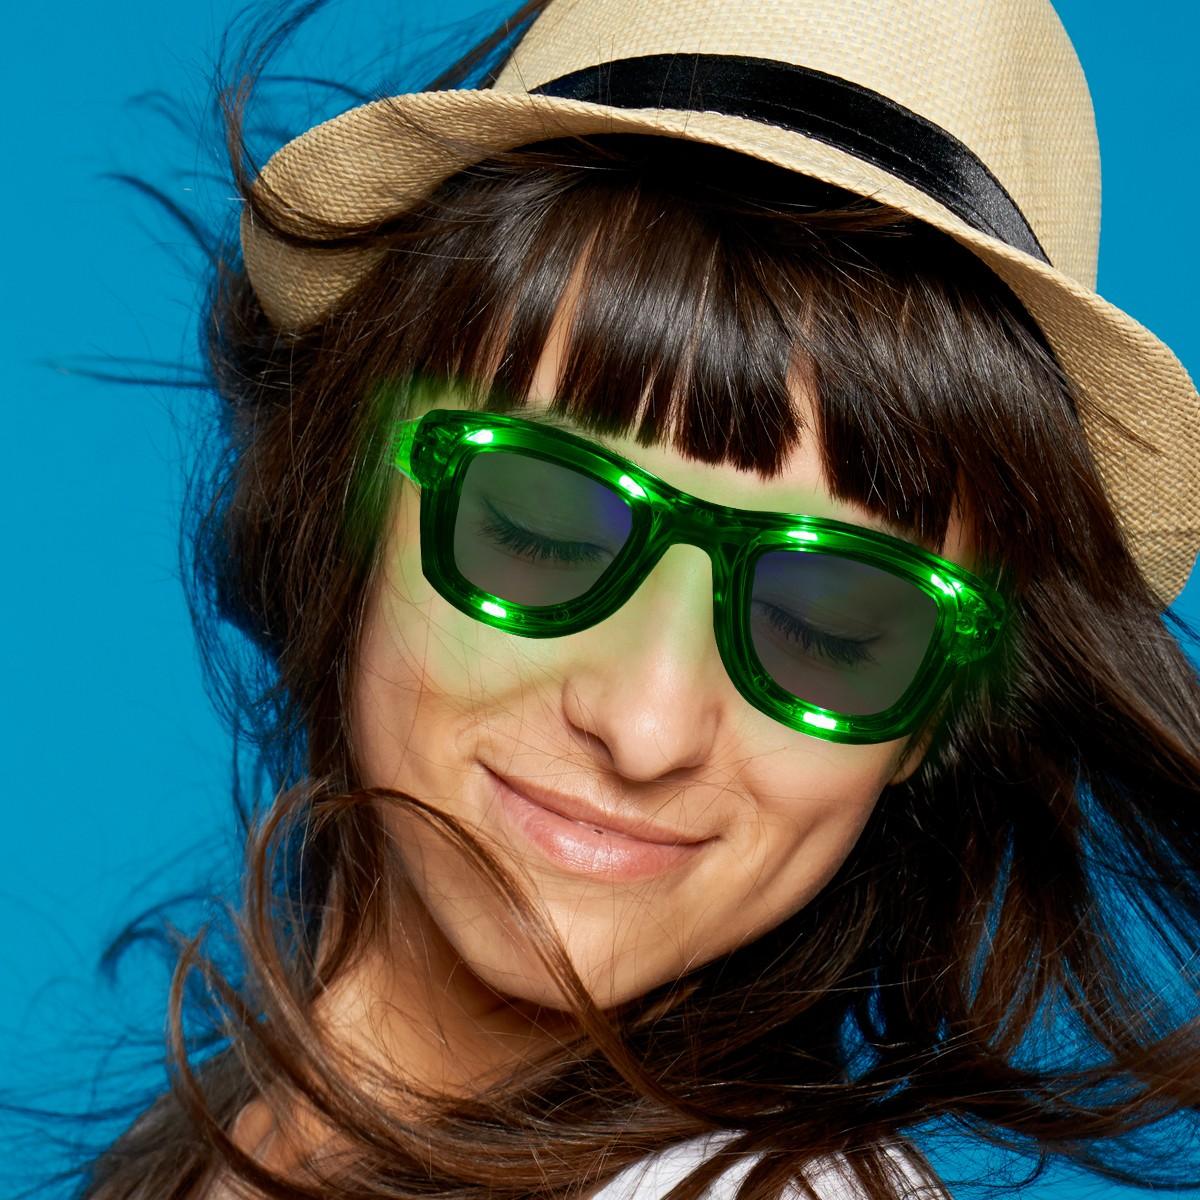 Green LED Classic Retro Sunglasses with Sound Option